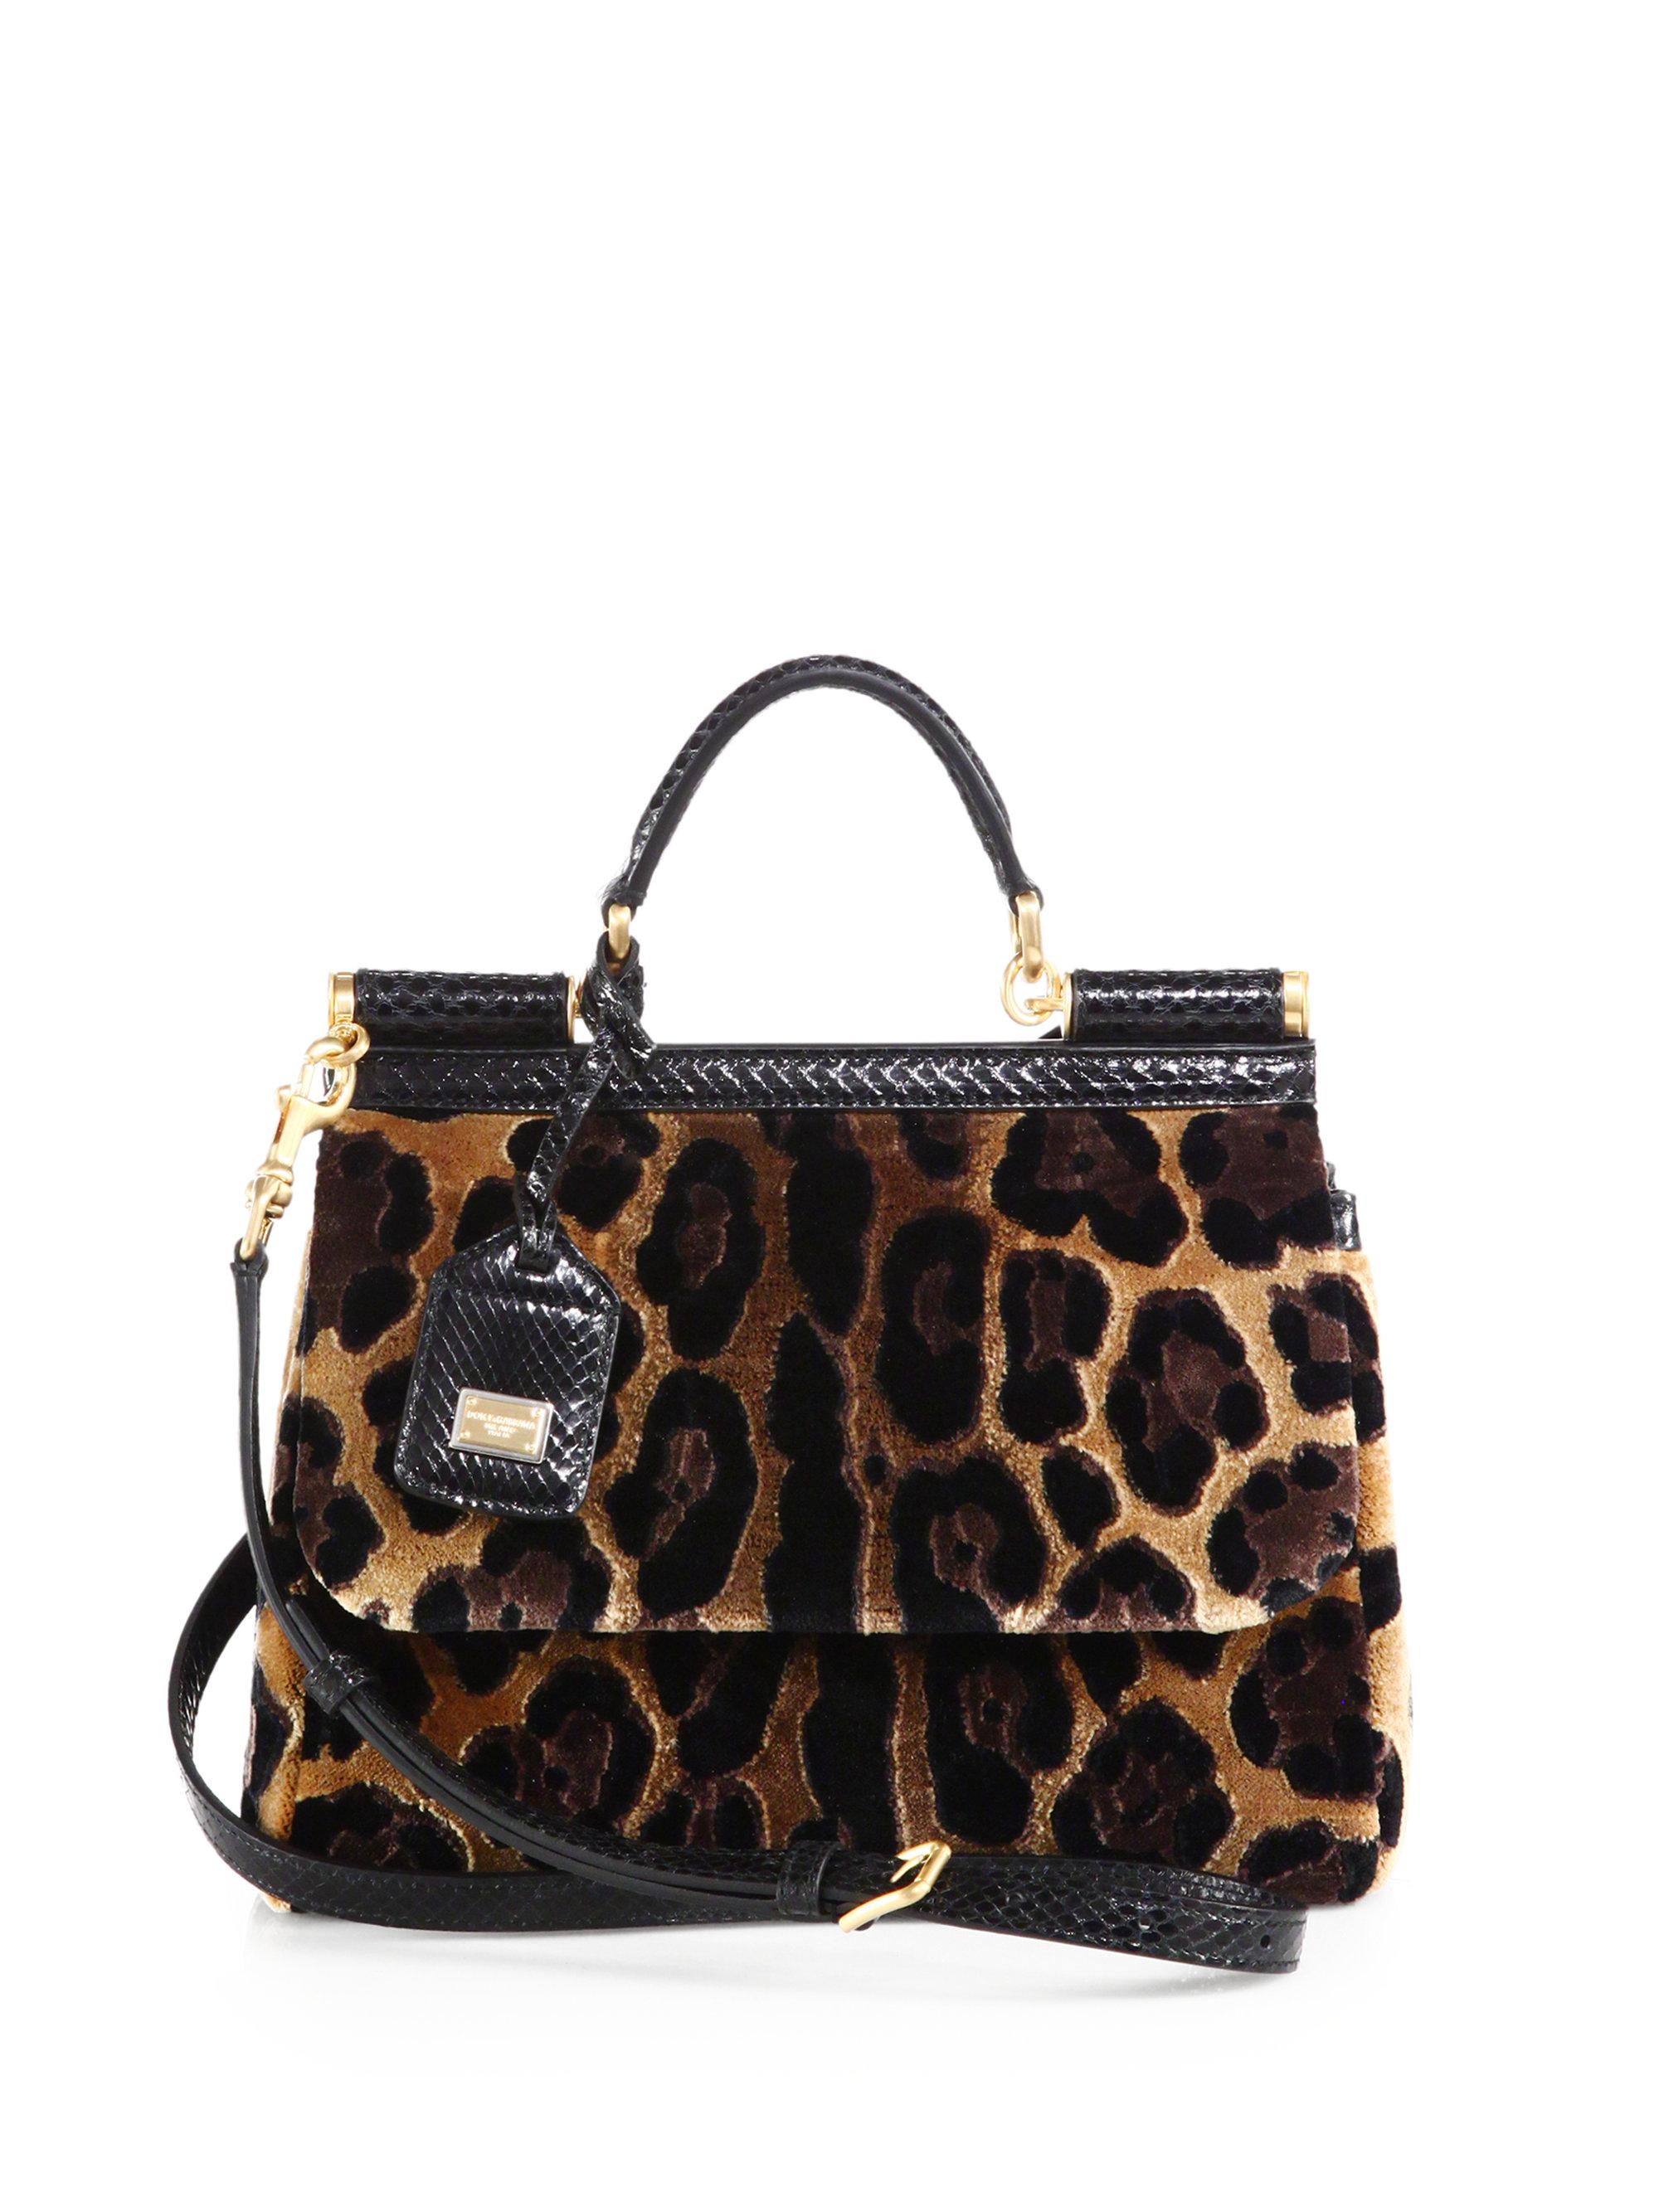 600c361abbd5 Lyst - Dolce   Gabbana Miss Sicily Leopard-Print Velvet Satchel